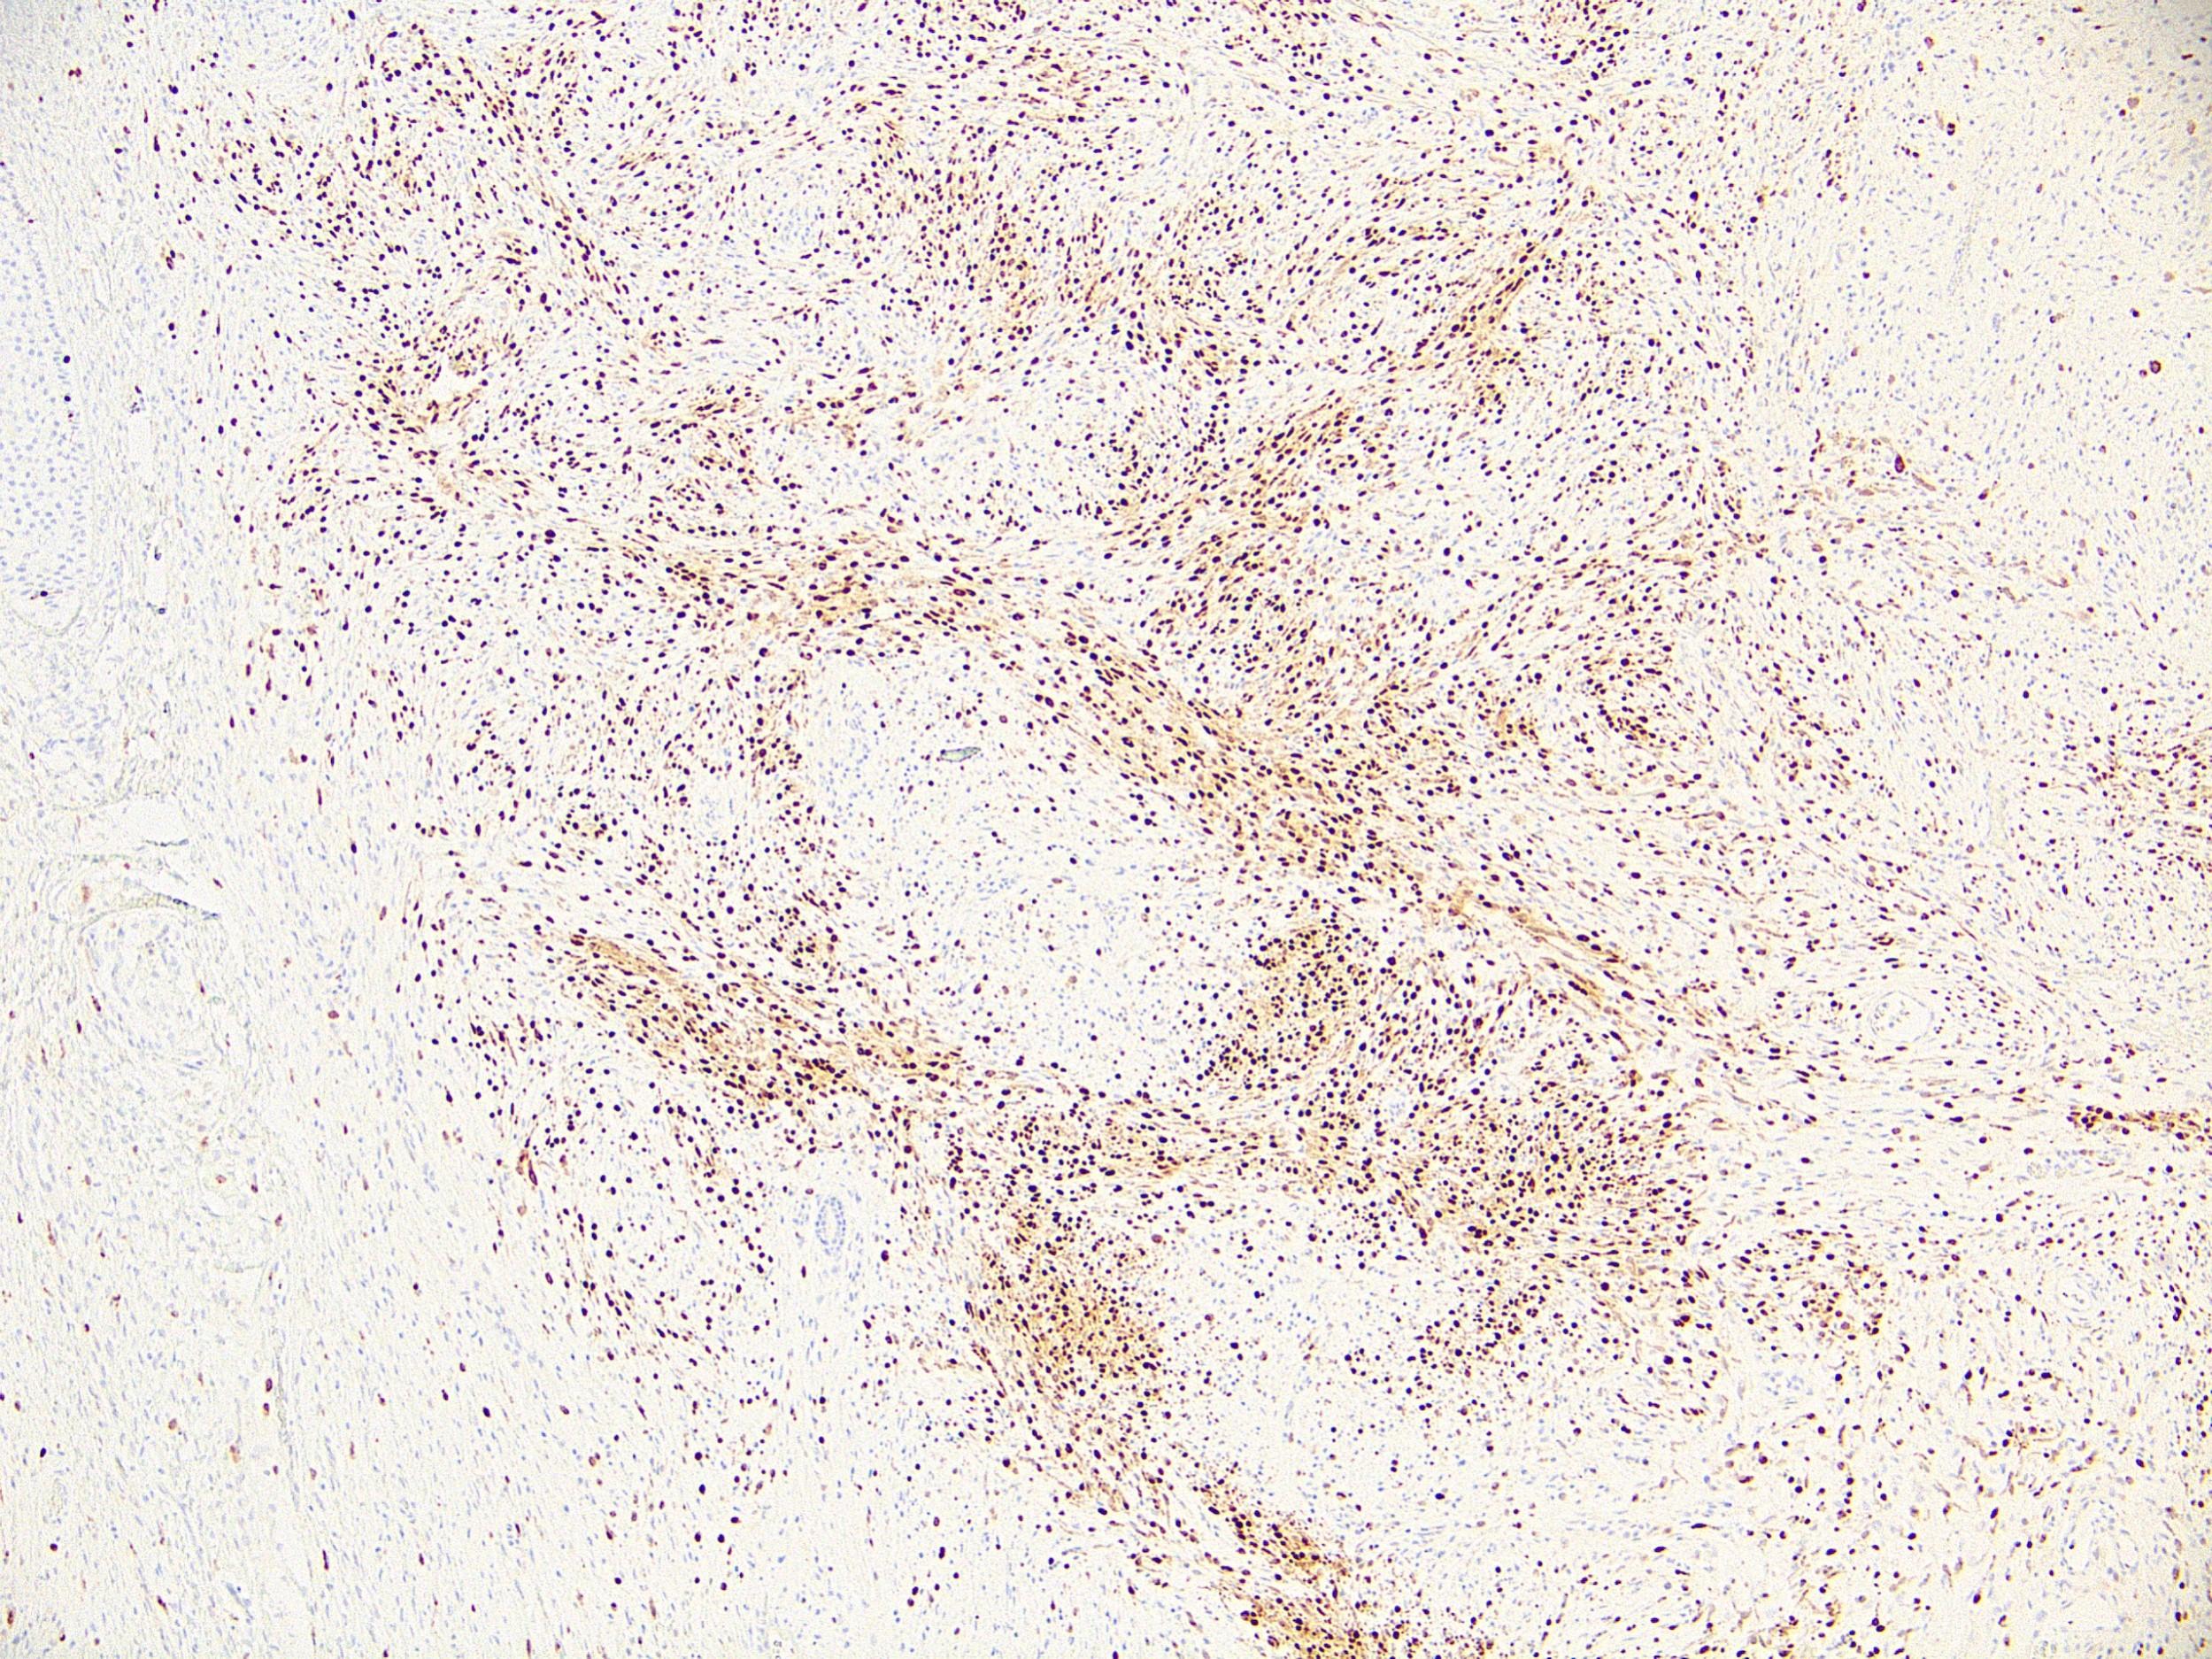 Neurocristic hamartoma MITF scanning